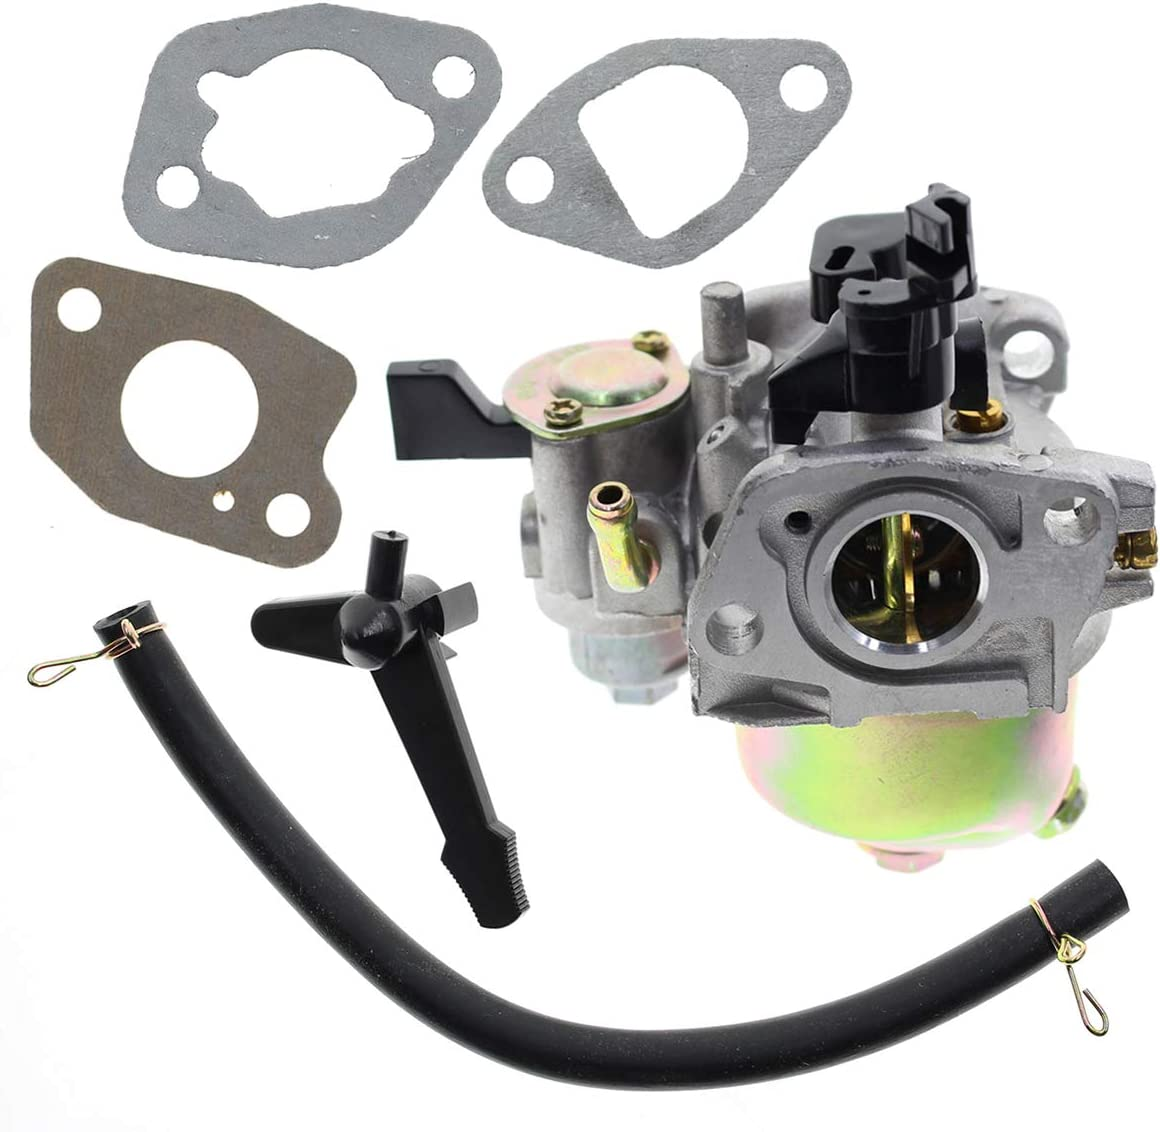 MOTOALL Carburetor w/Gaskets for Honda 6.5 HP Engine Harbor Freight Predator 212cc 16100-ZLO-W51 16100-ZH8-W61